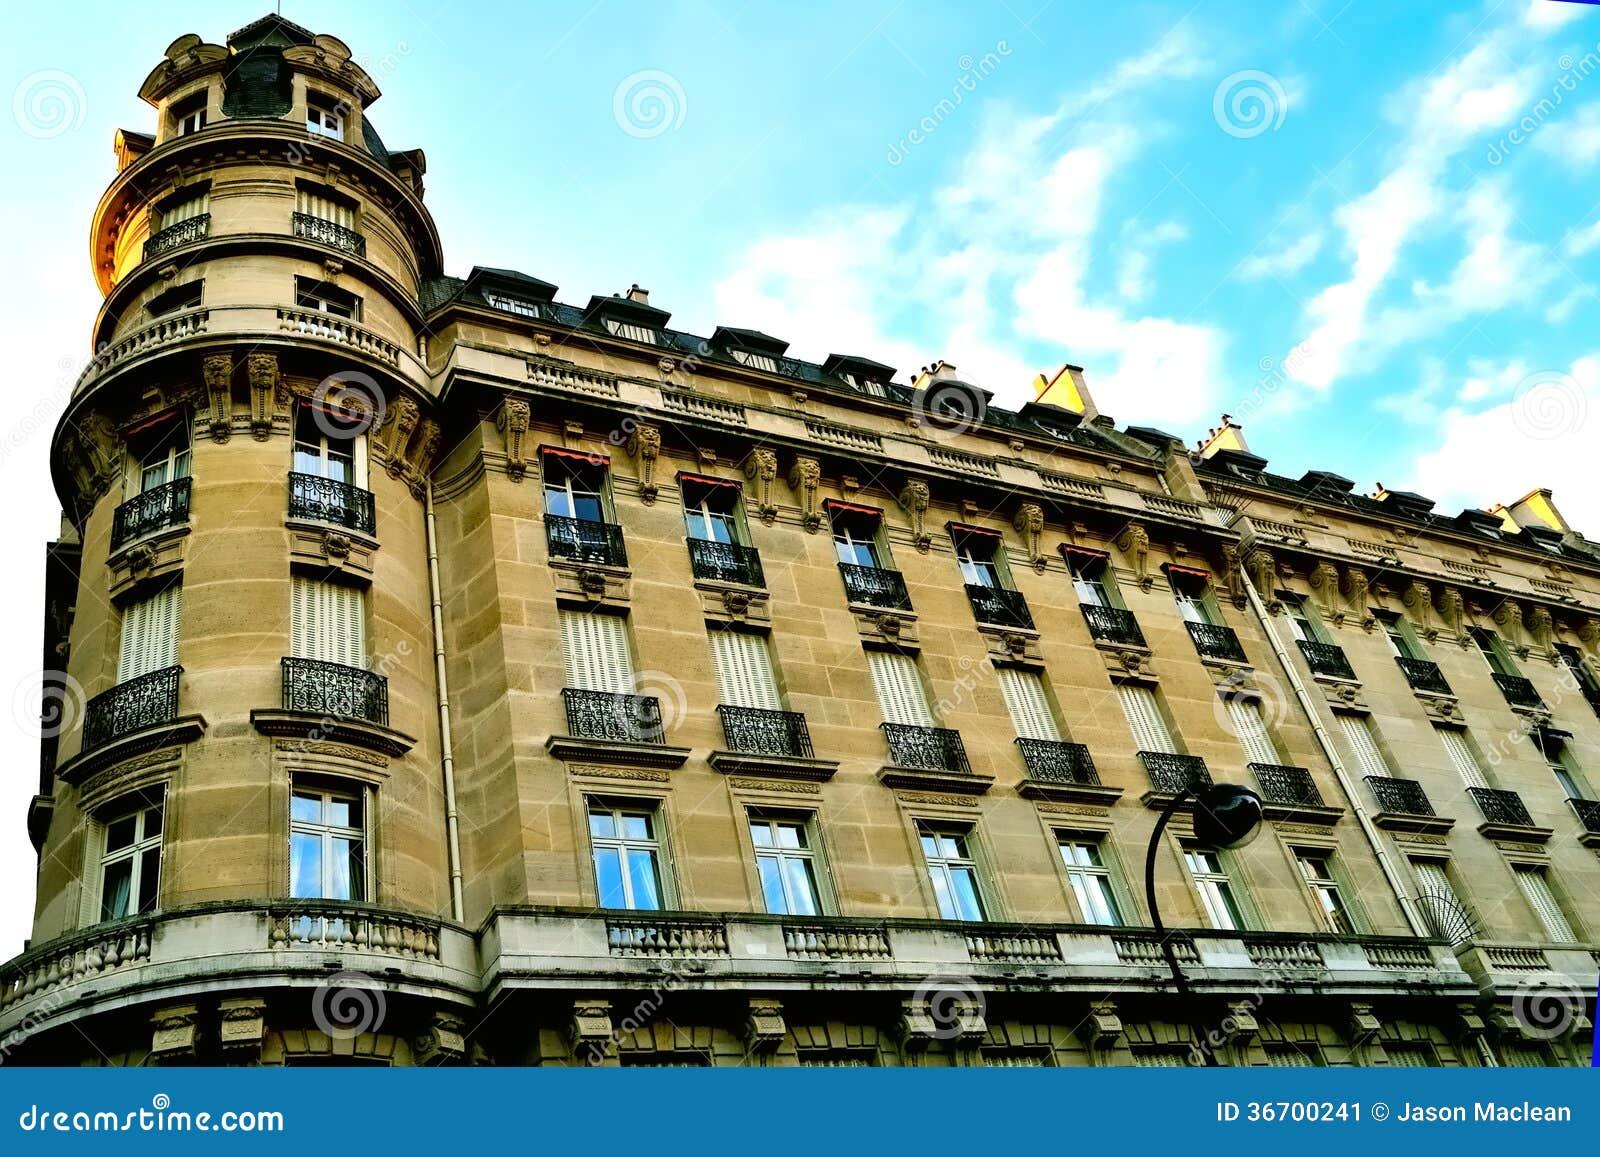 haussman architecture apartment building in paris editorial photo image 36700241. Black Bedroom Furniture Sets. Home Design Ideas